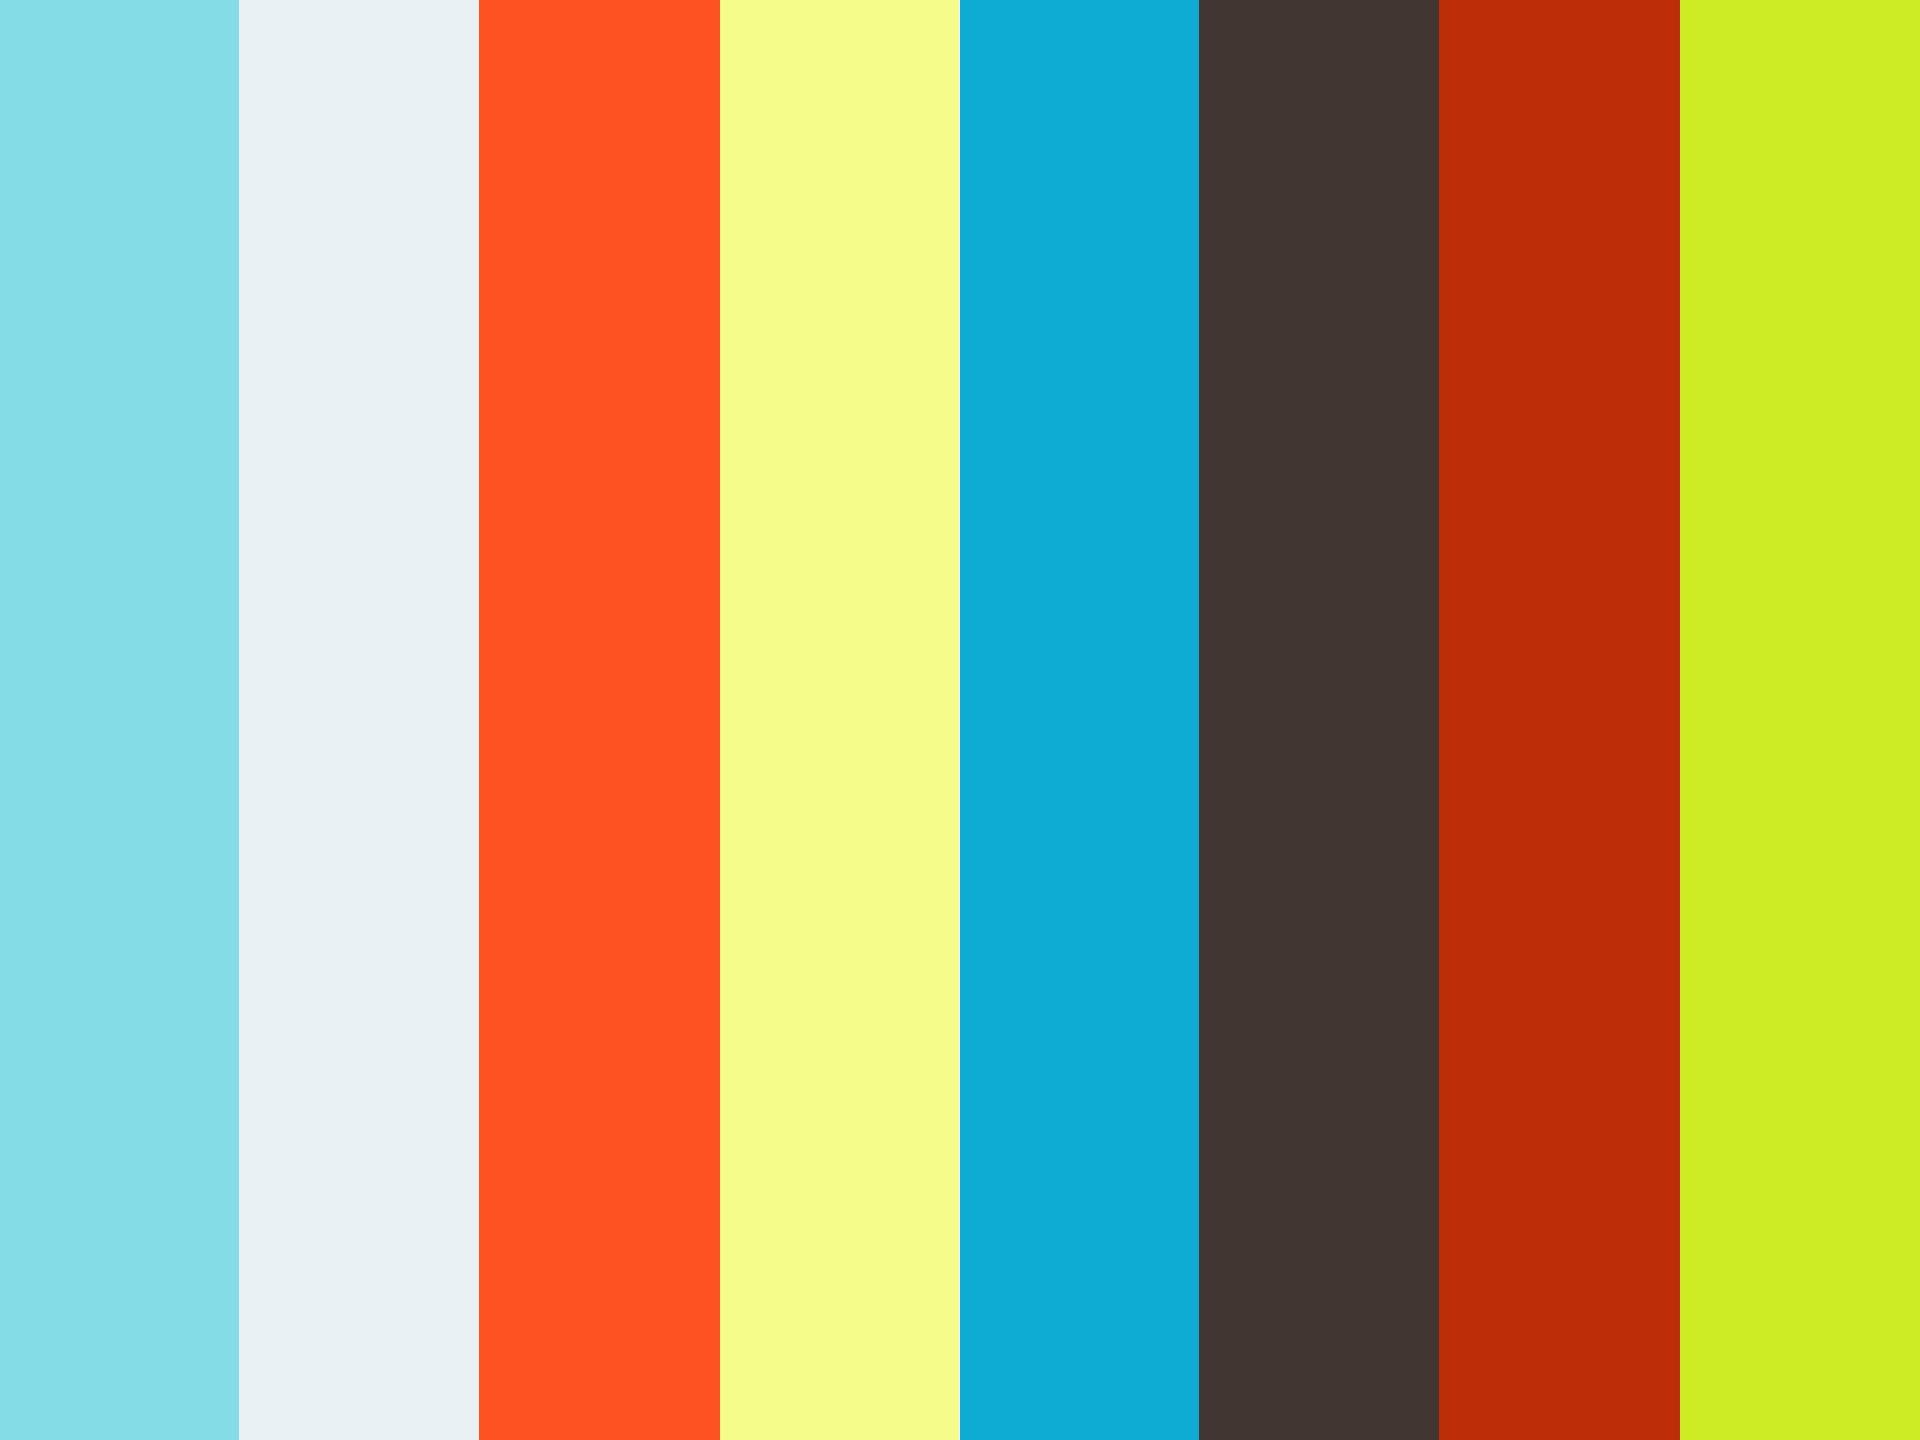 Overlay?src0=https%3a%2f%2fi.vimeocdn.com%2fvideo%2f492974496 1280x720.jpg&src1=https%3a%2f%2ff.vimeocdn.com%2fimages v6%2fshare%2fplay icon overlay